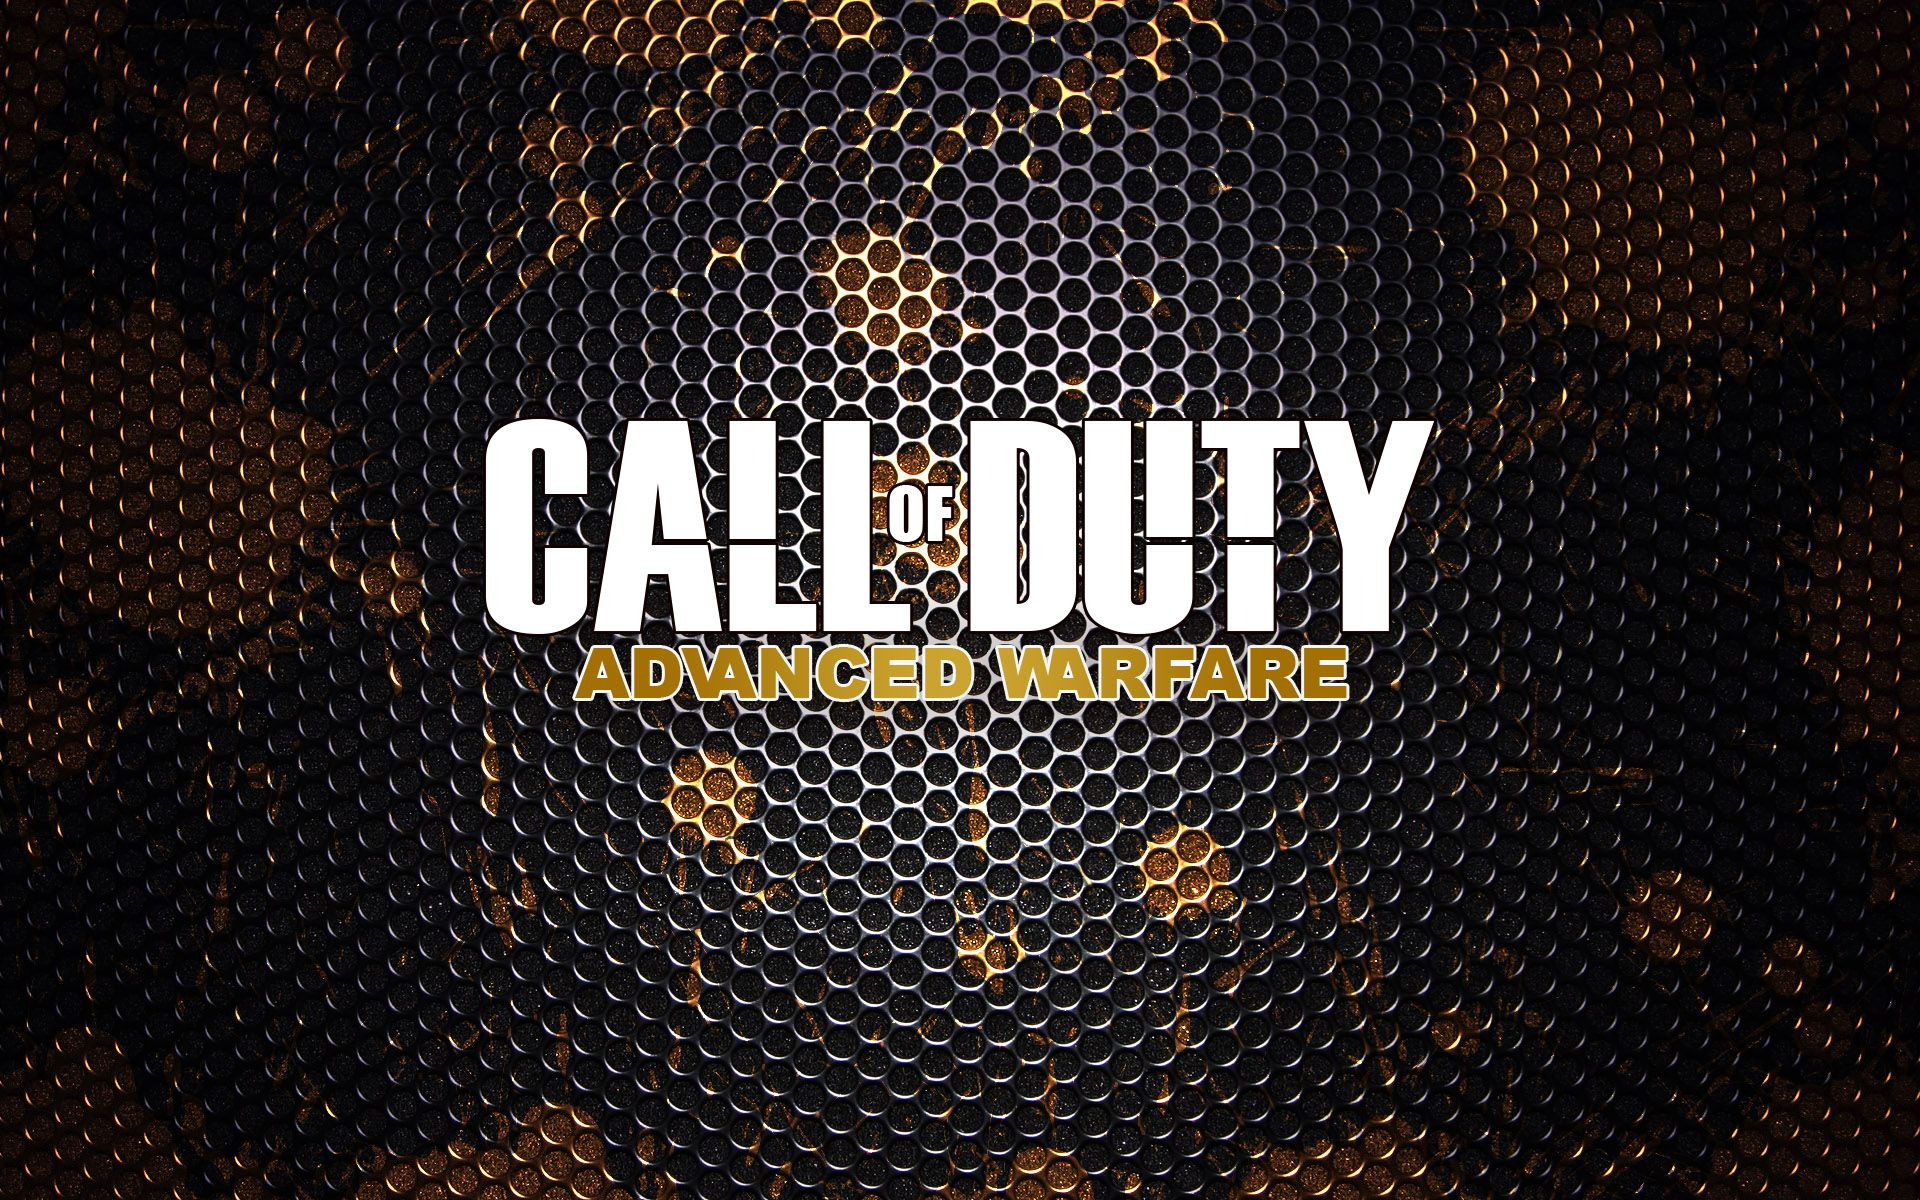 Call Of Duty Advanced Warfare Paint Logo Desktop Photo Call Of Duty Advanced Warfare Call Of Duty Aw